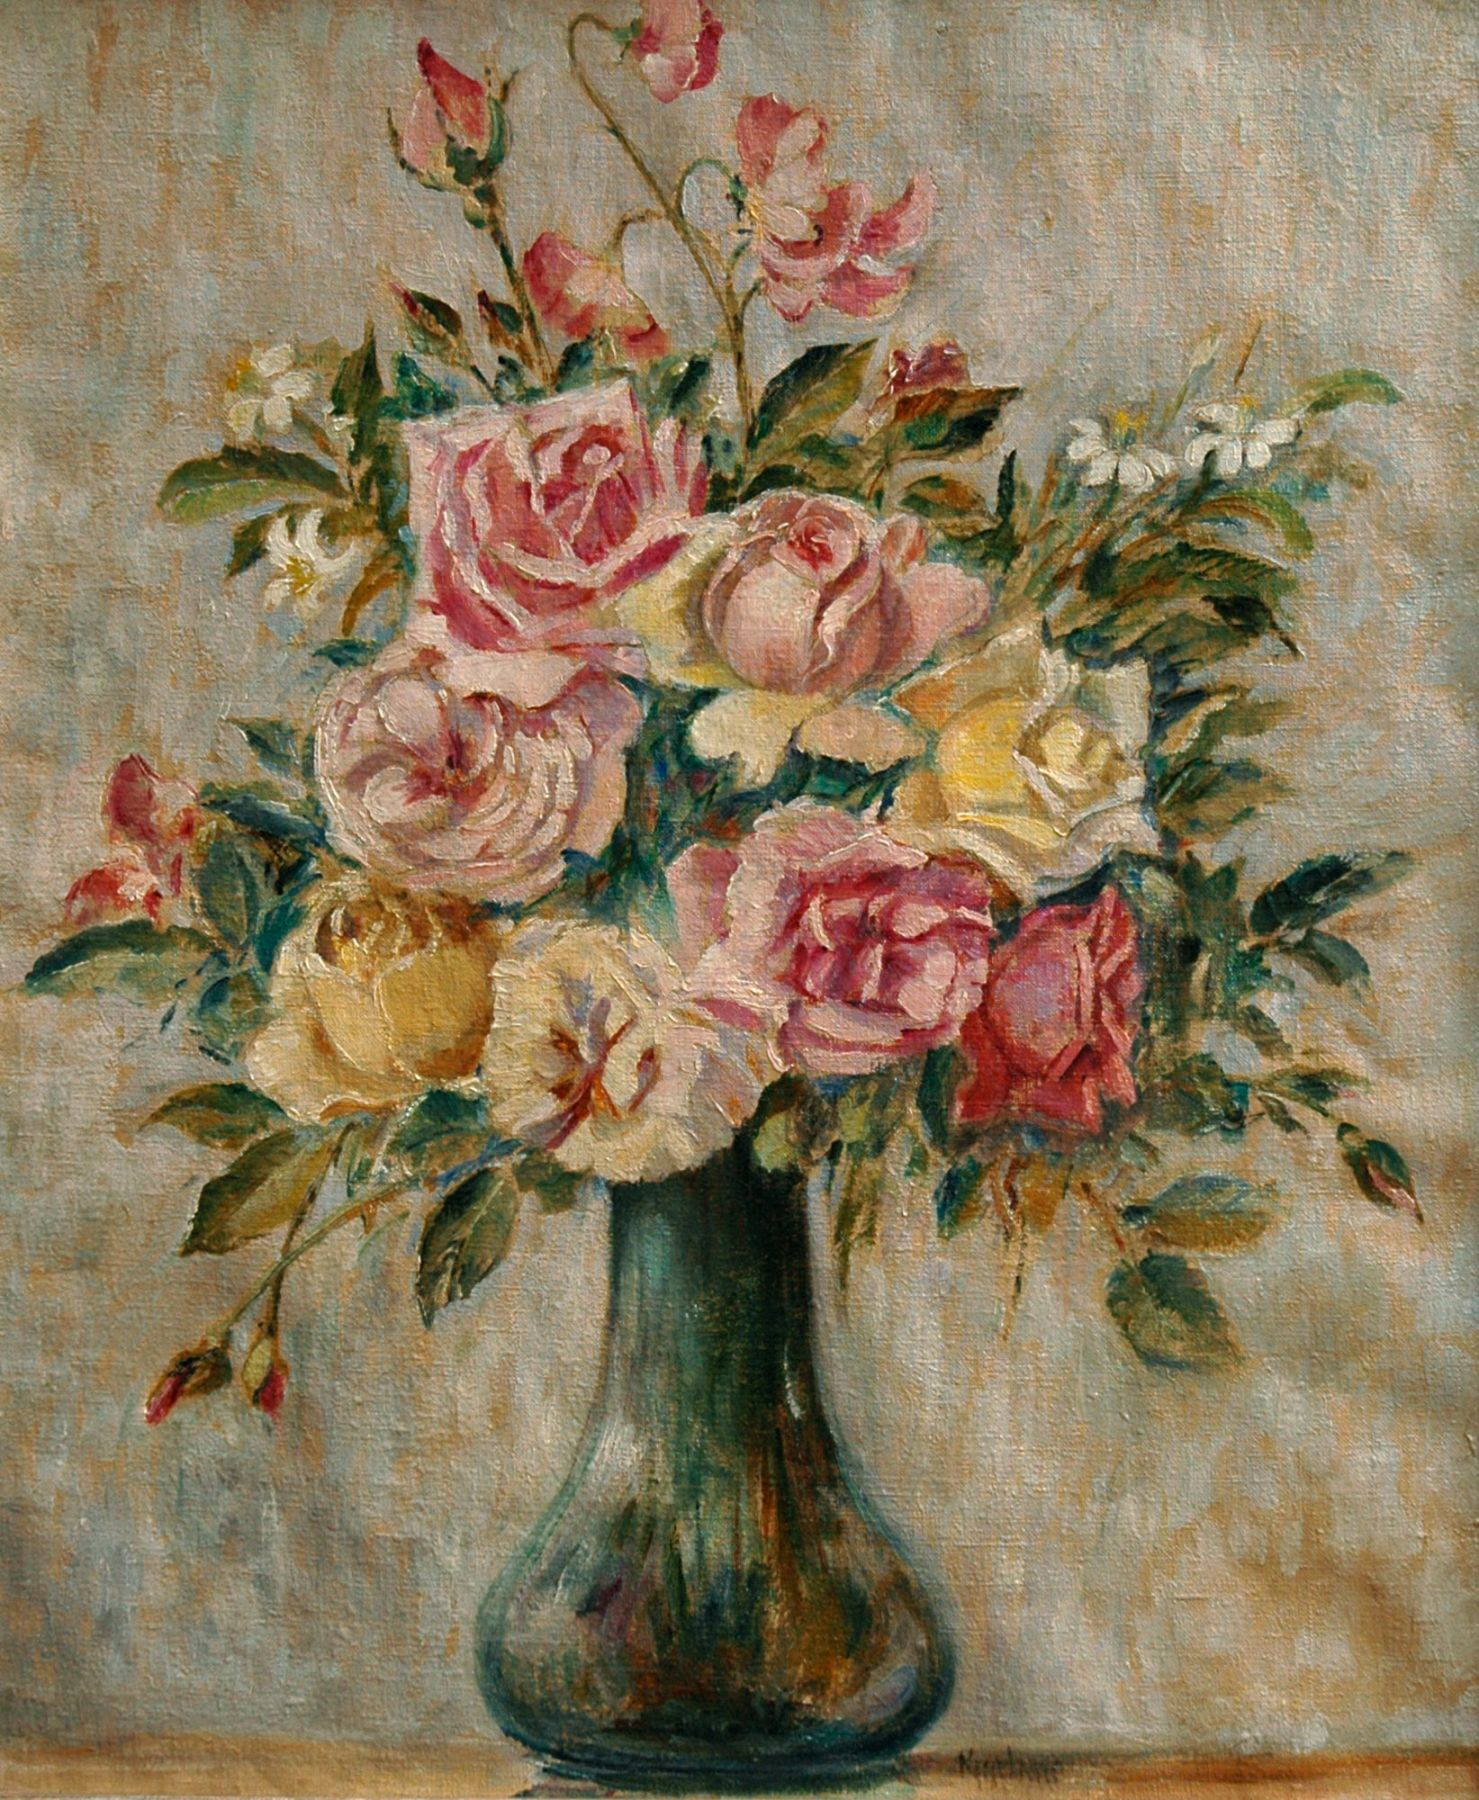 MAX KUEHNE (1880-1968), Roses, 1952